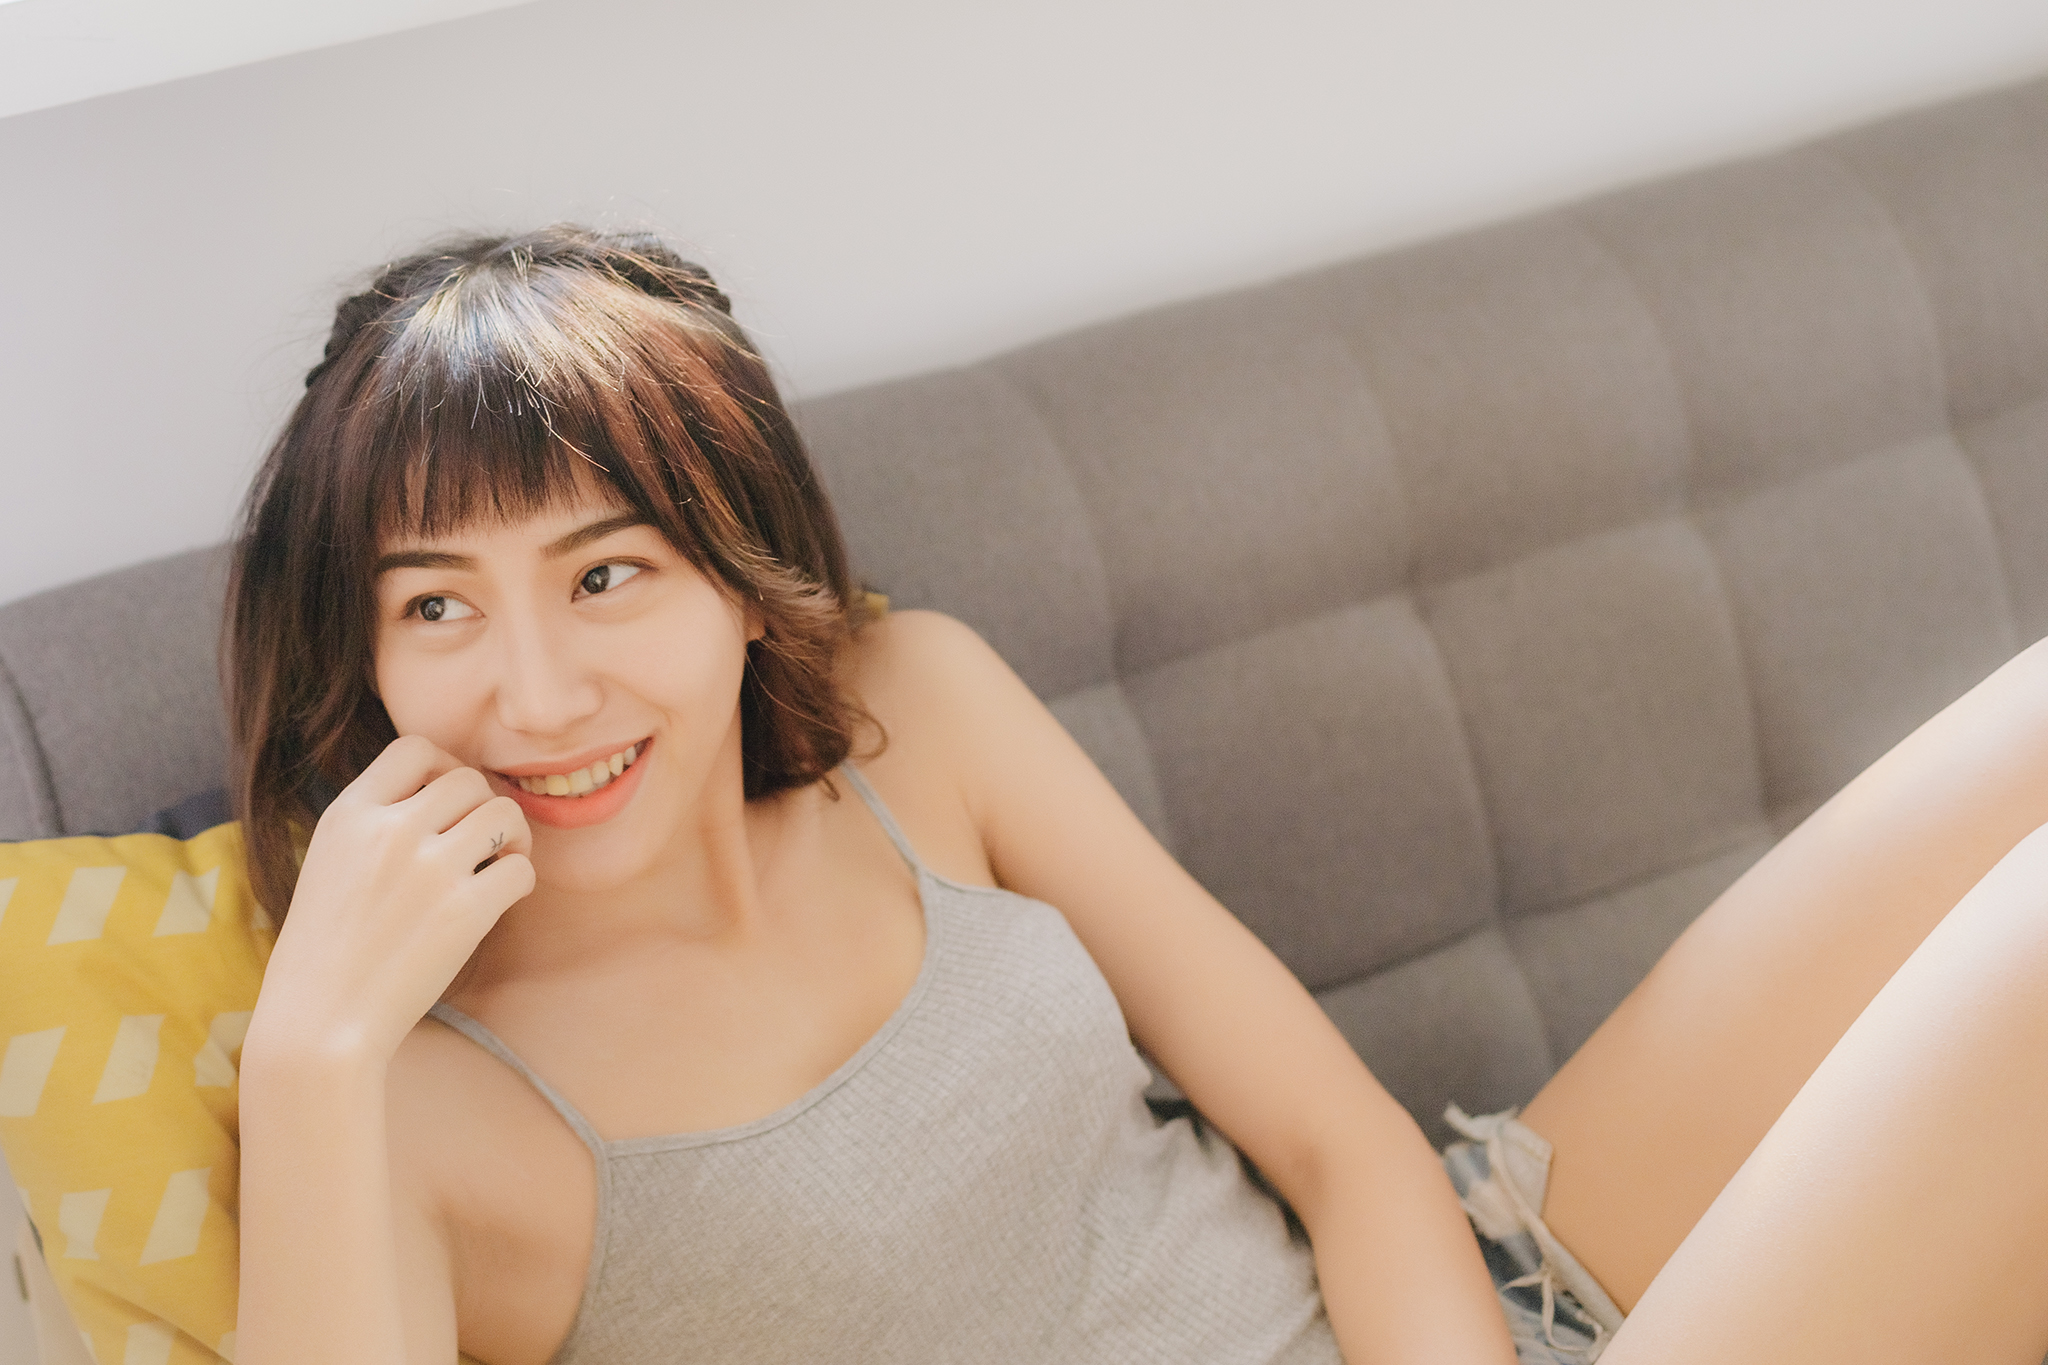 46851205501 ceeb707576 o - 【情侶寫真】+Isaac & Syuan+